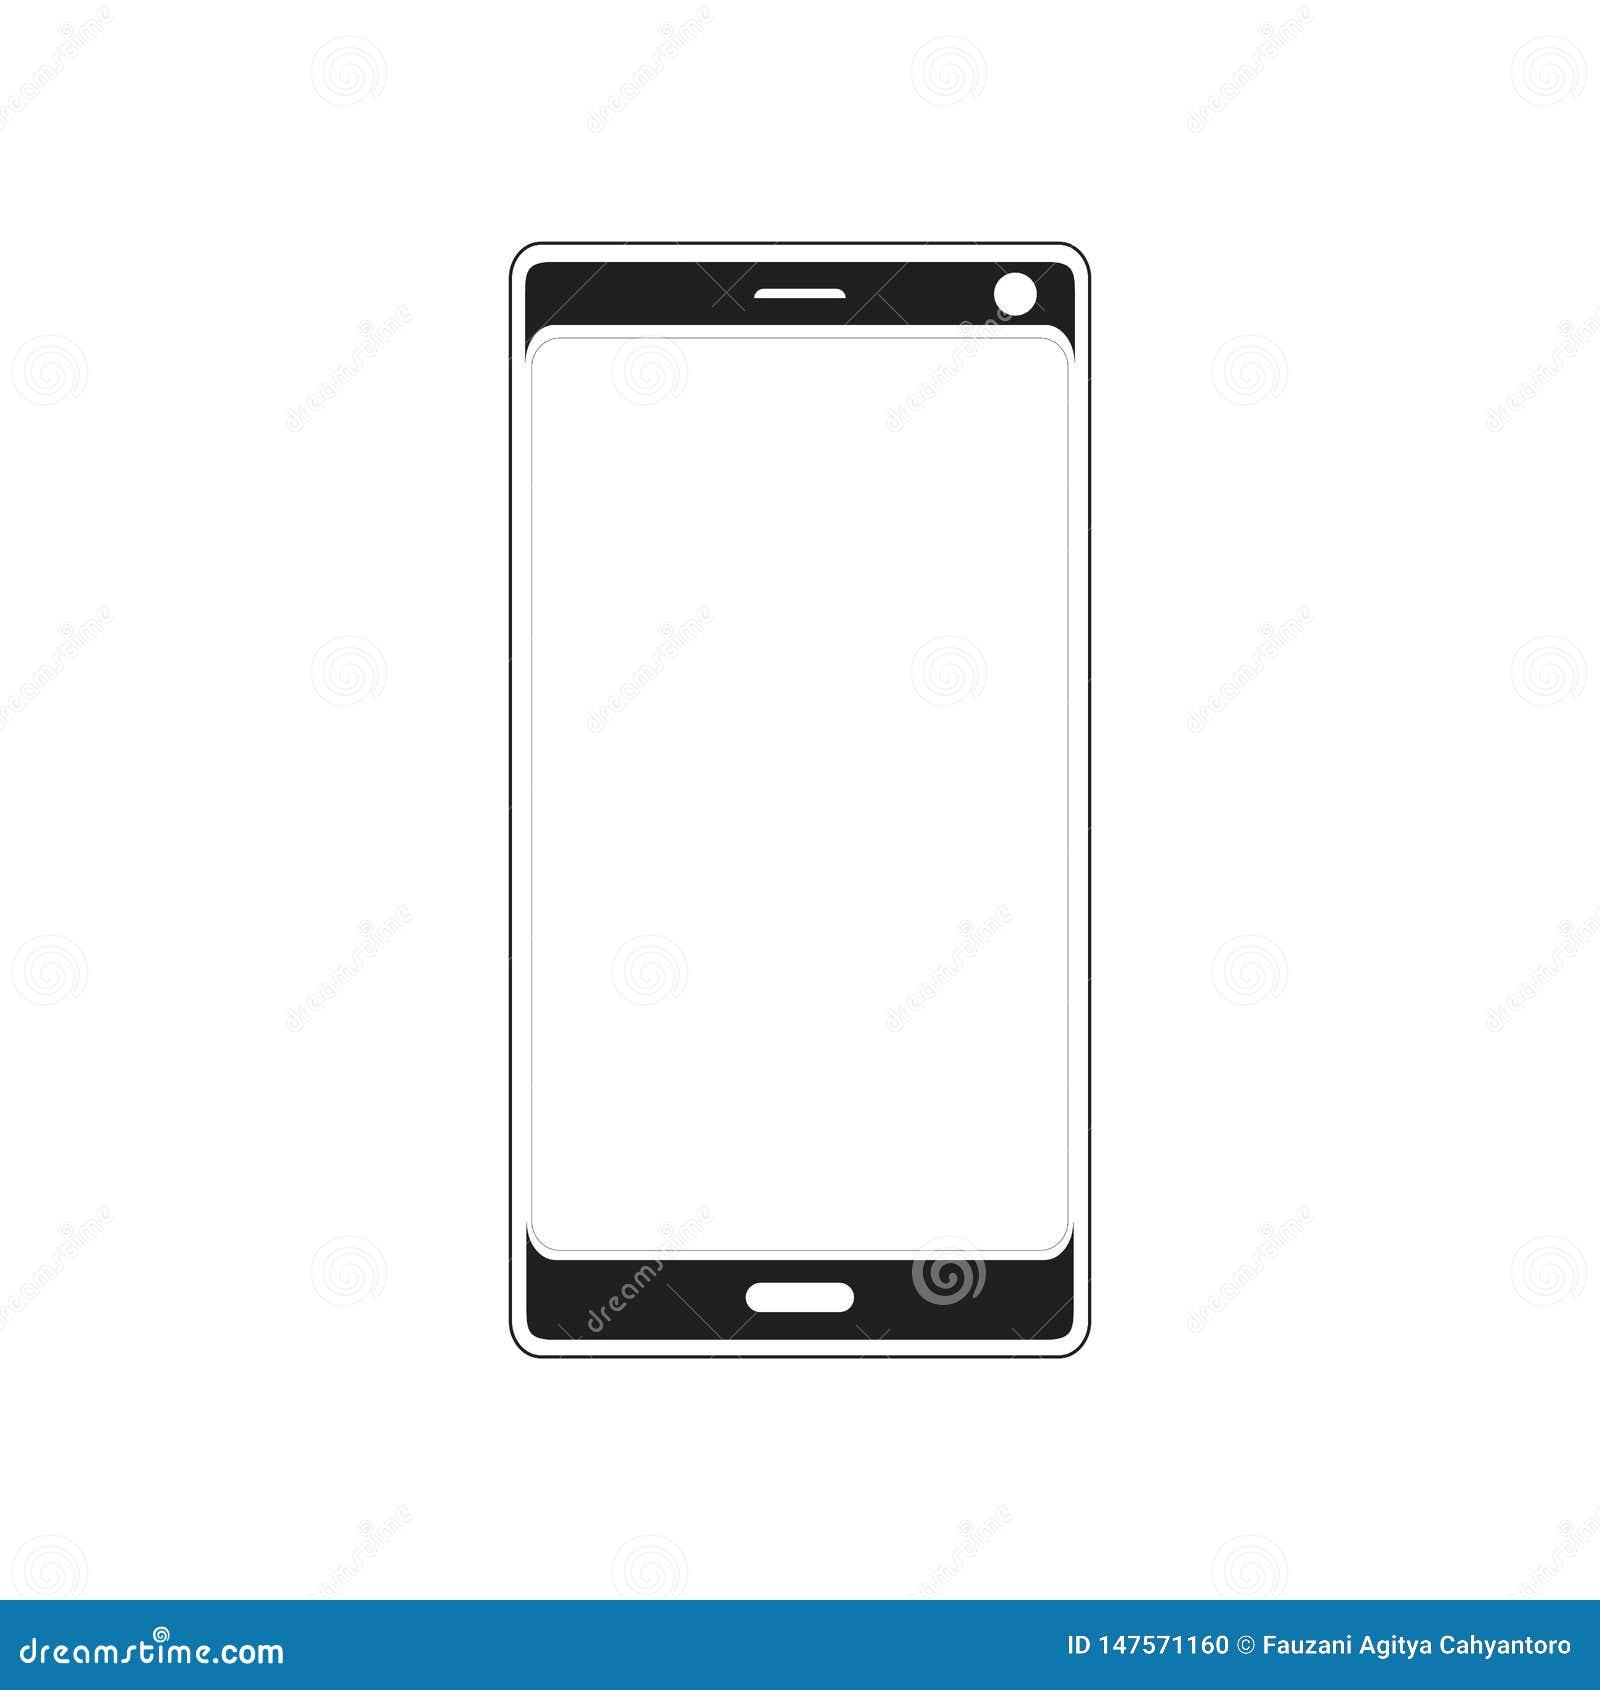 Современная концепция логотипа силуэта смартфона